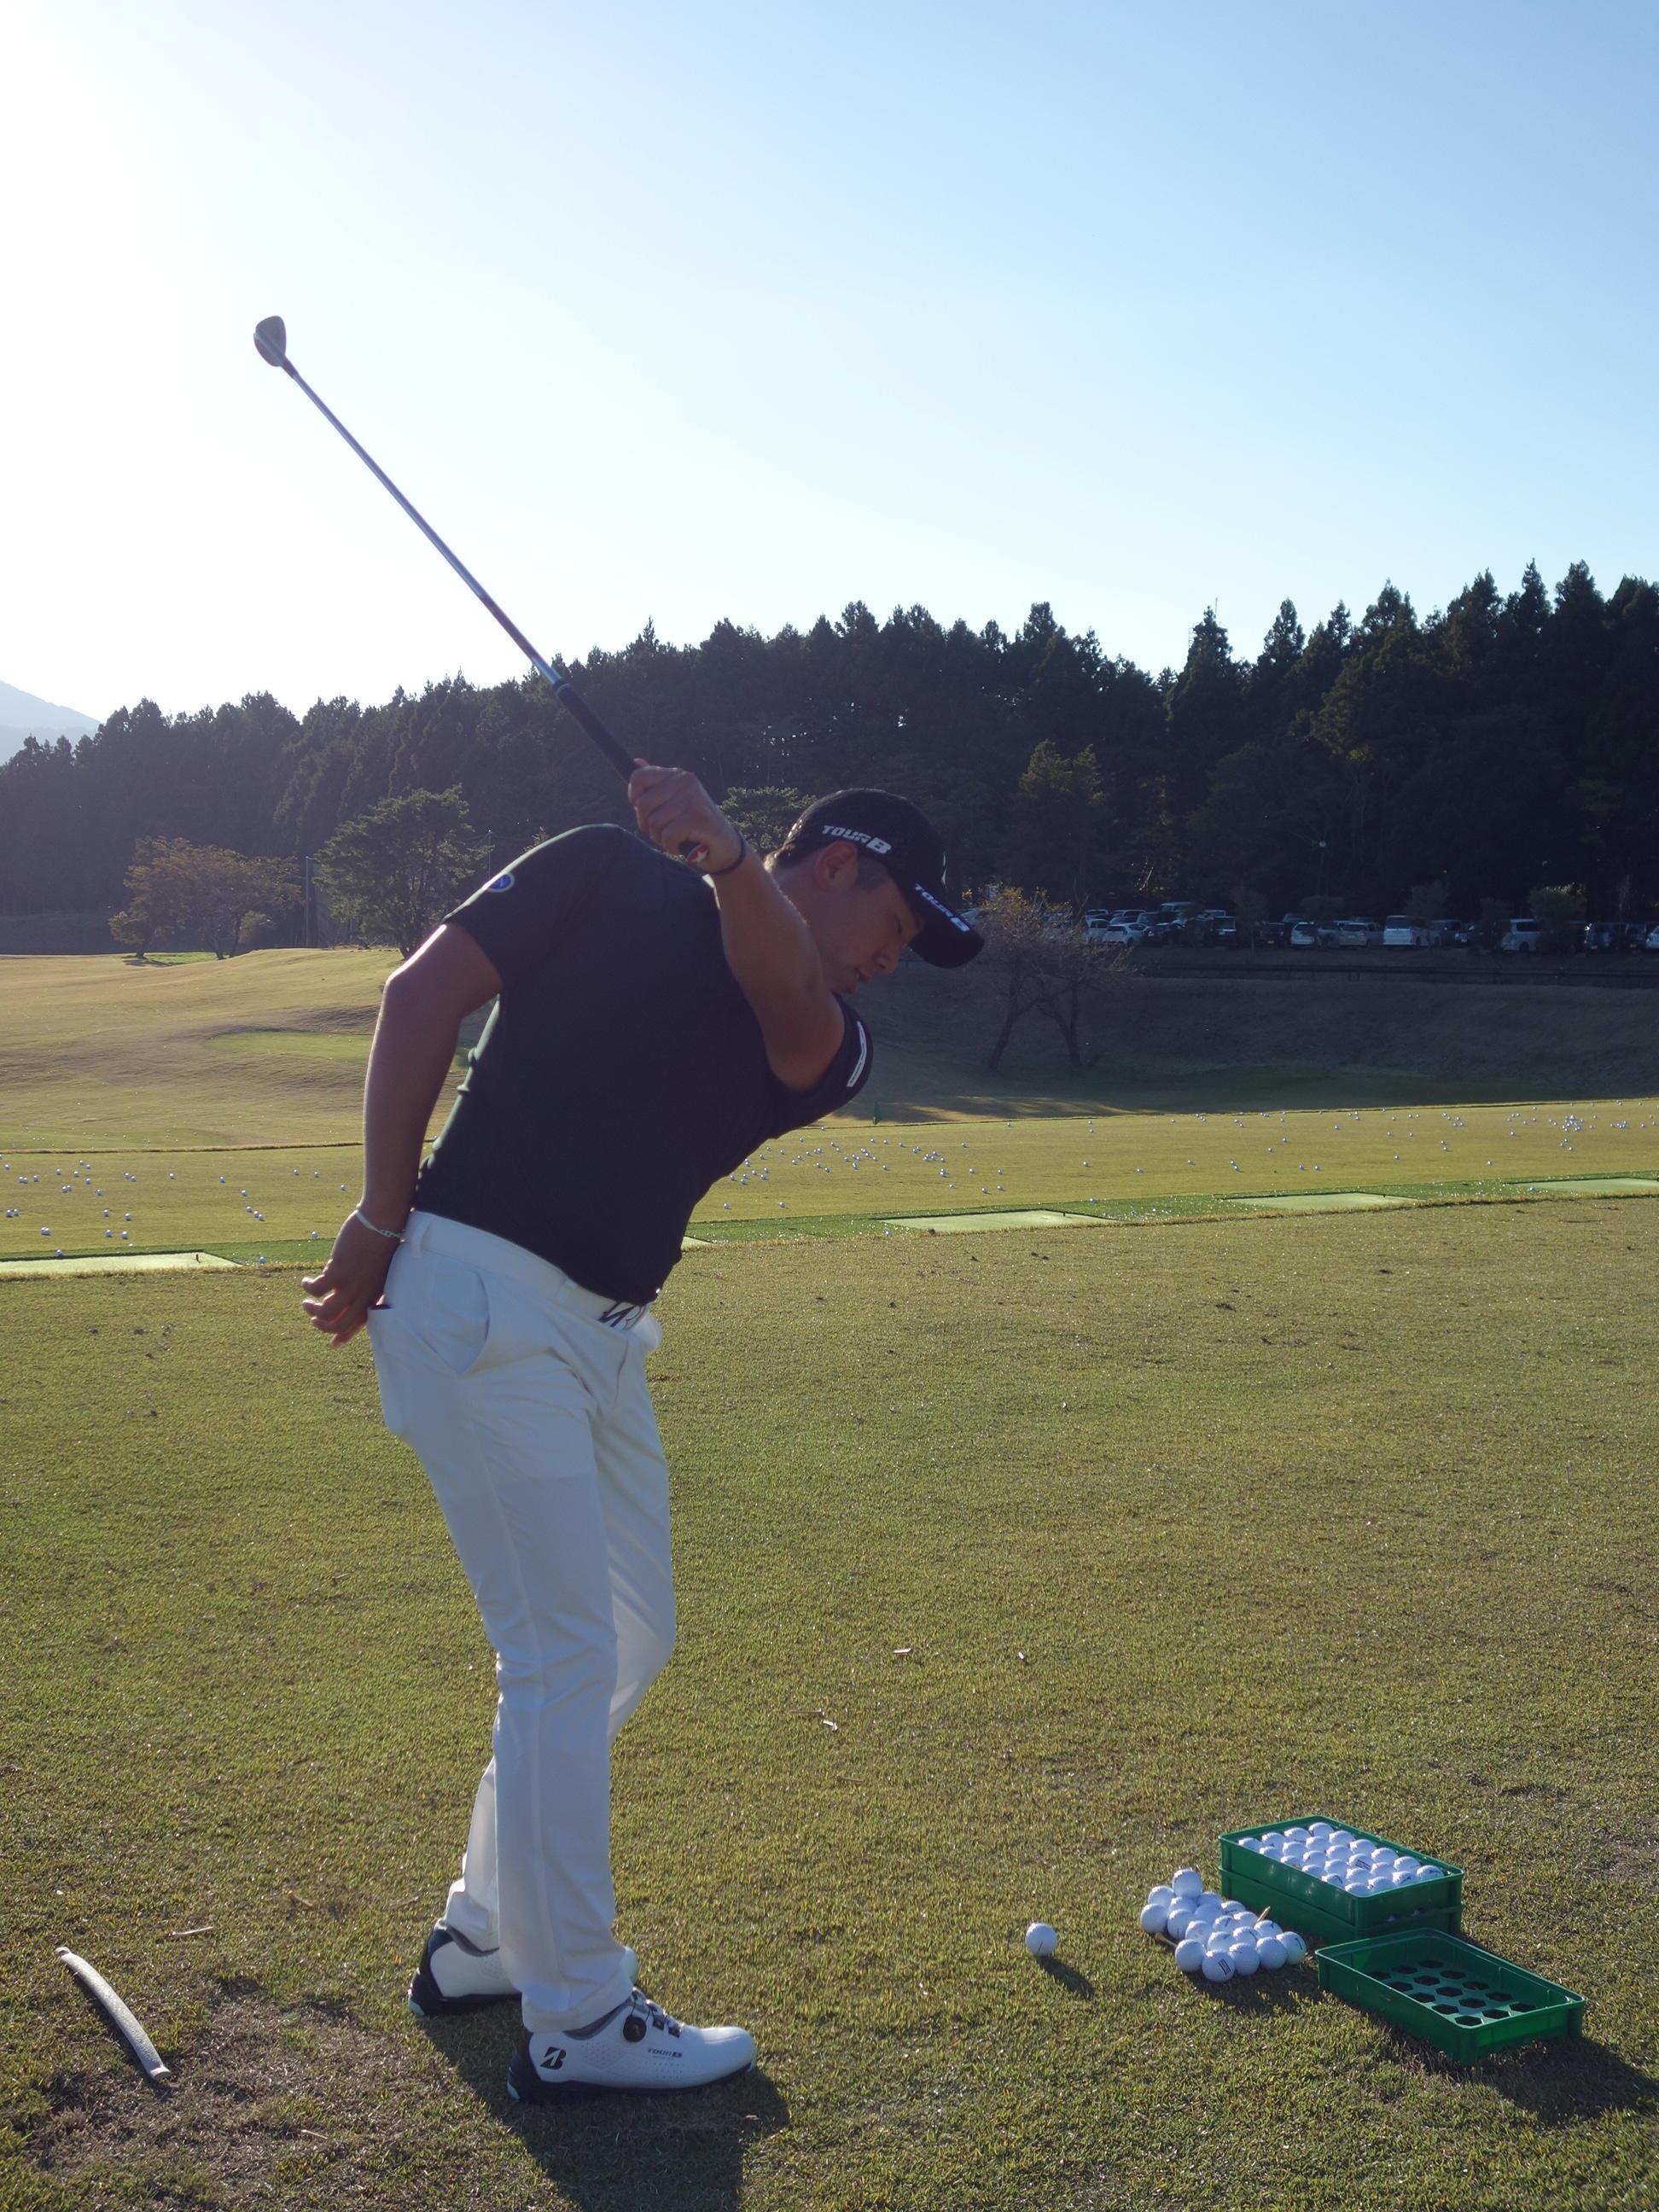 https://www.bs-golf.com/pro/22d52c53d26453221c2acf44696137d9a60fd52c.JPG